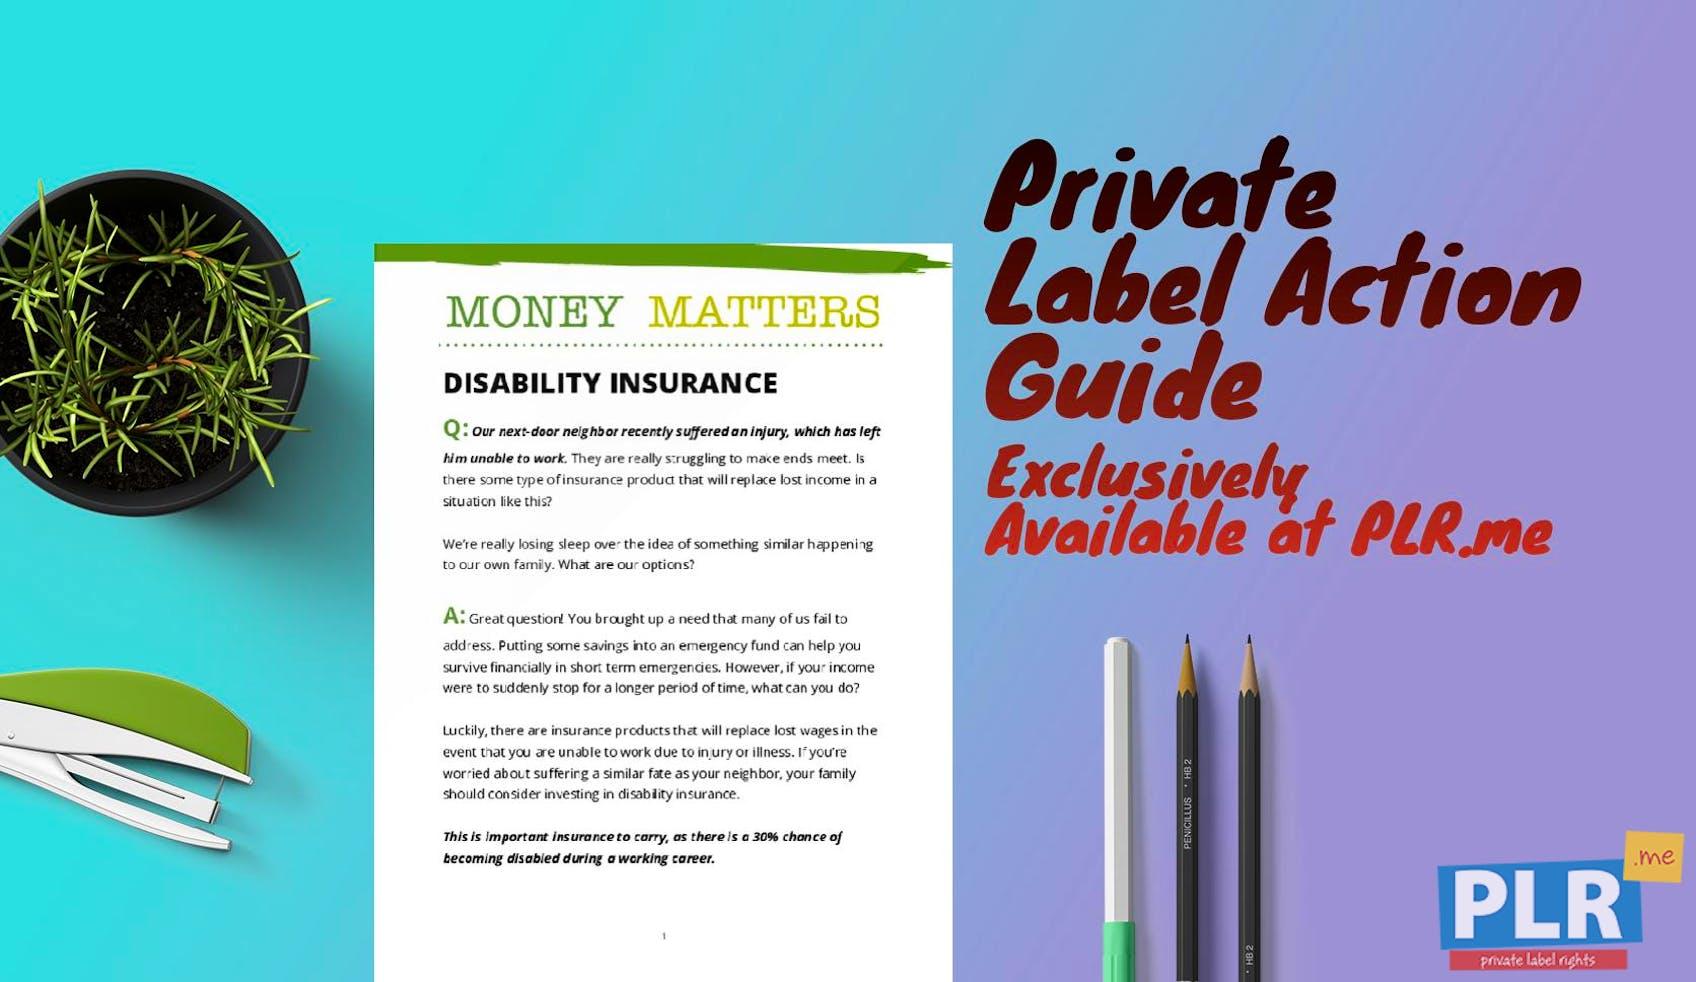 Money Matters Disability Insurance